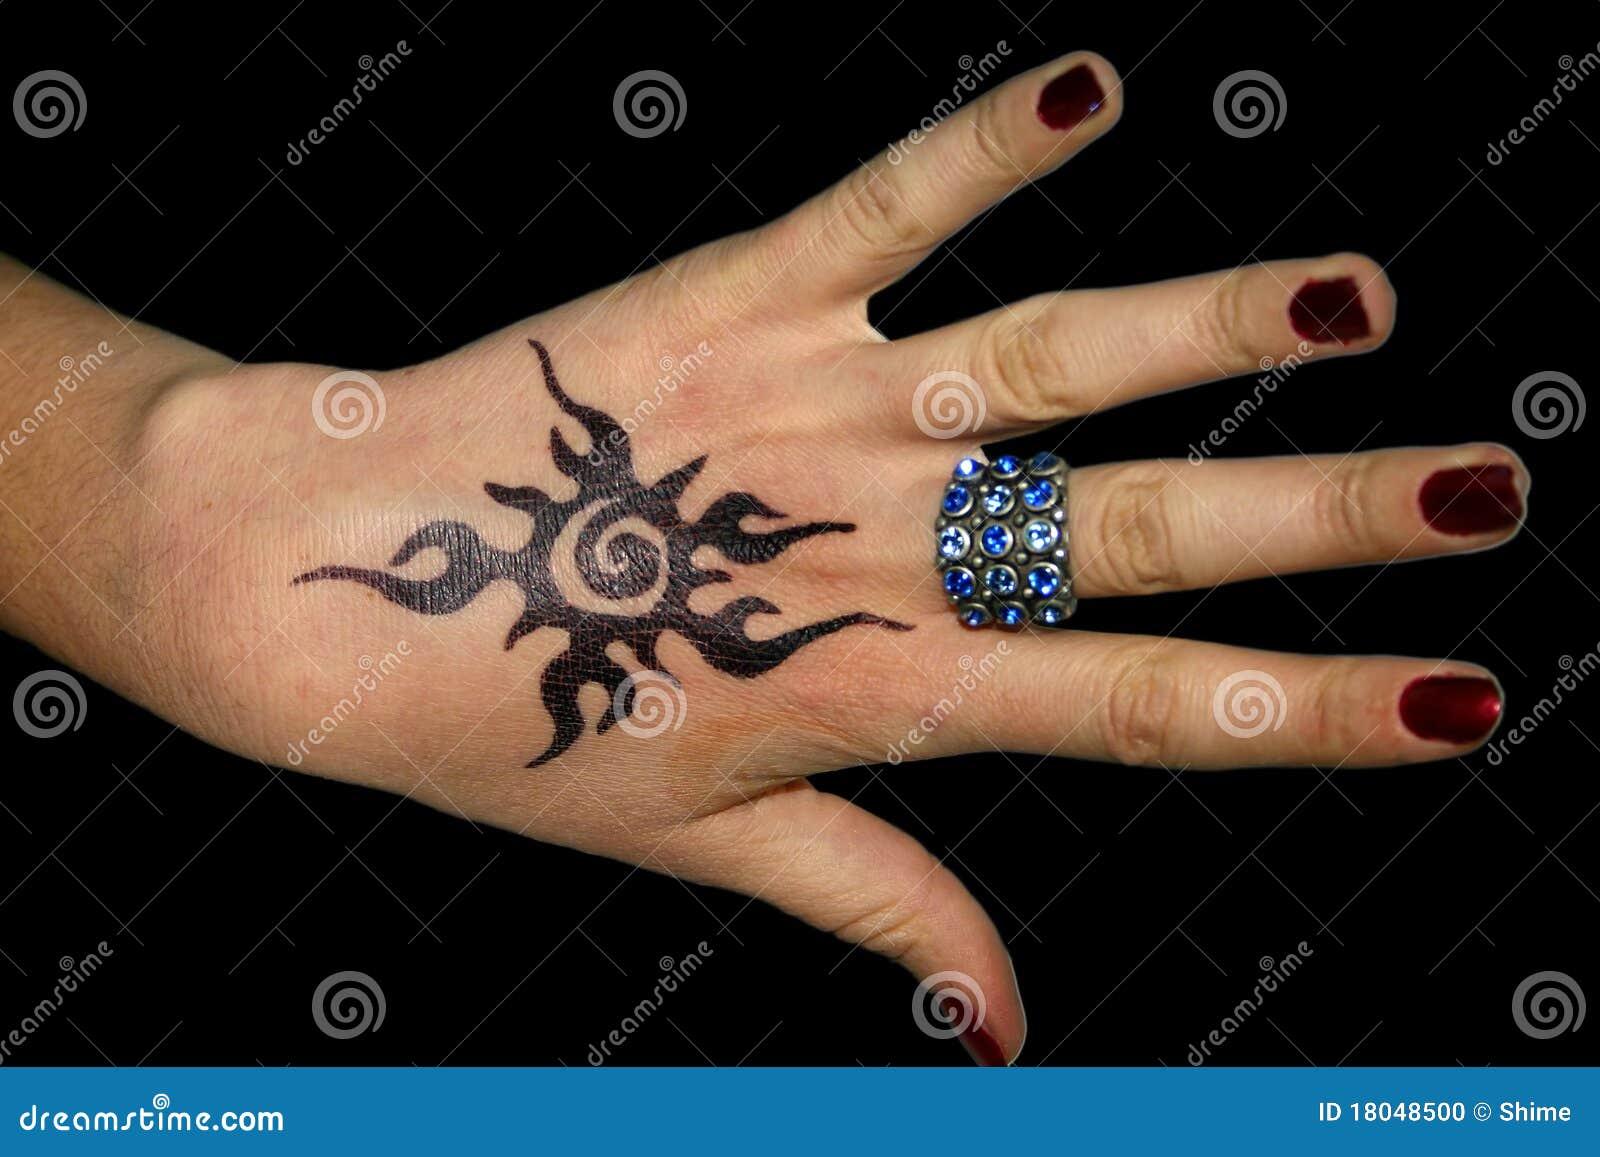 Tattoo Stock Photos: Tattoo Stock Photo. Image Of Adolescence, Rebel, Metal